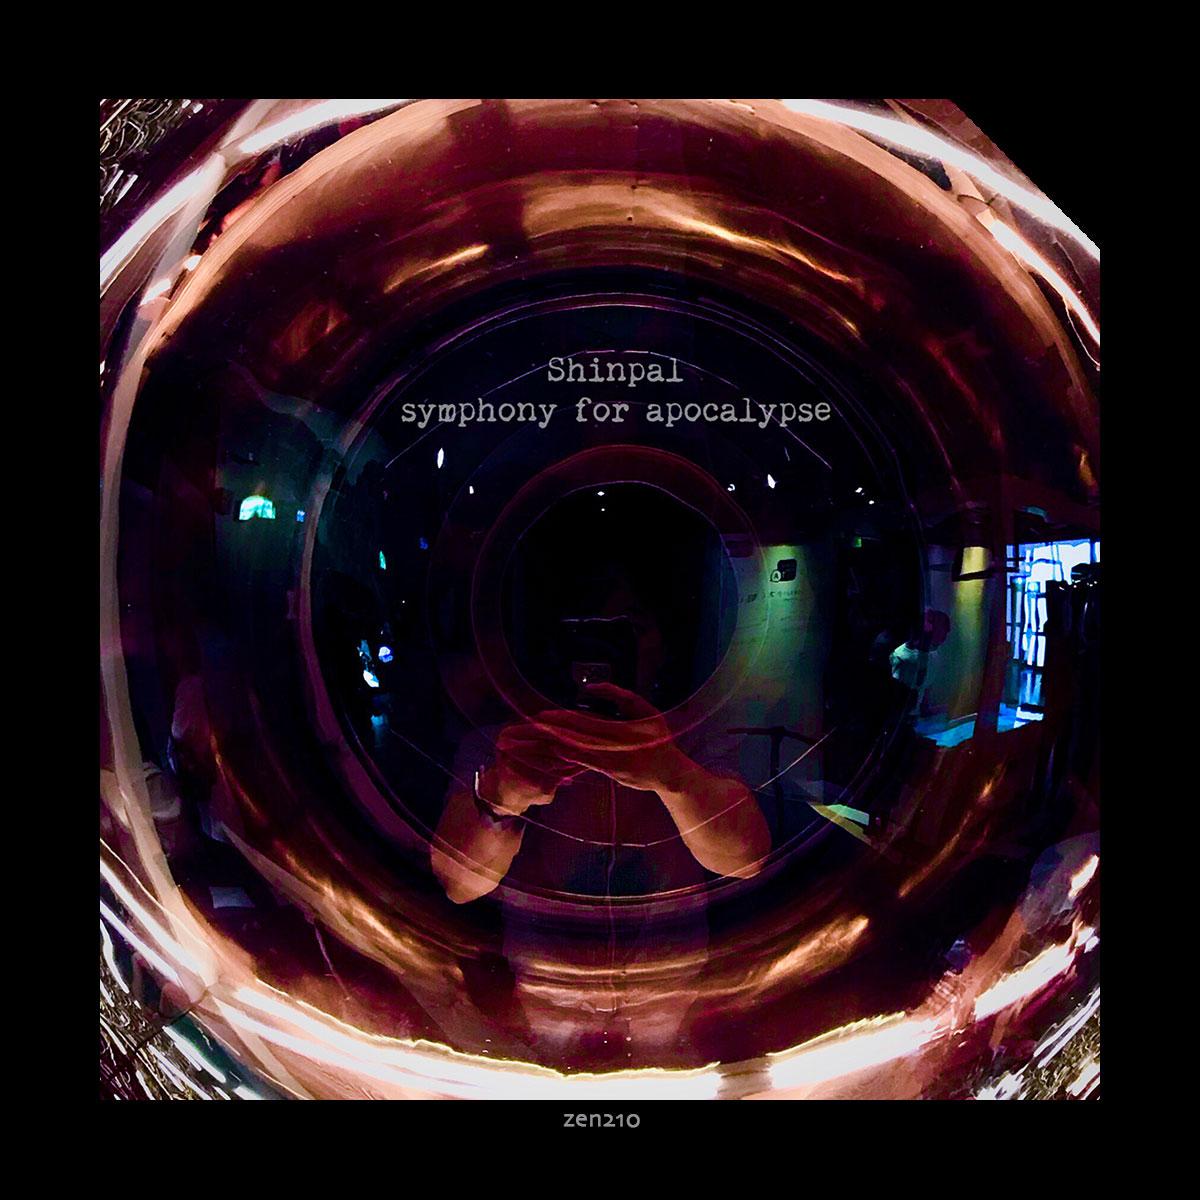 Shinpal – Symphony for Apocalypse